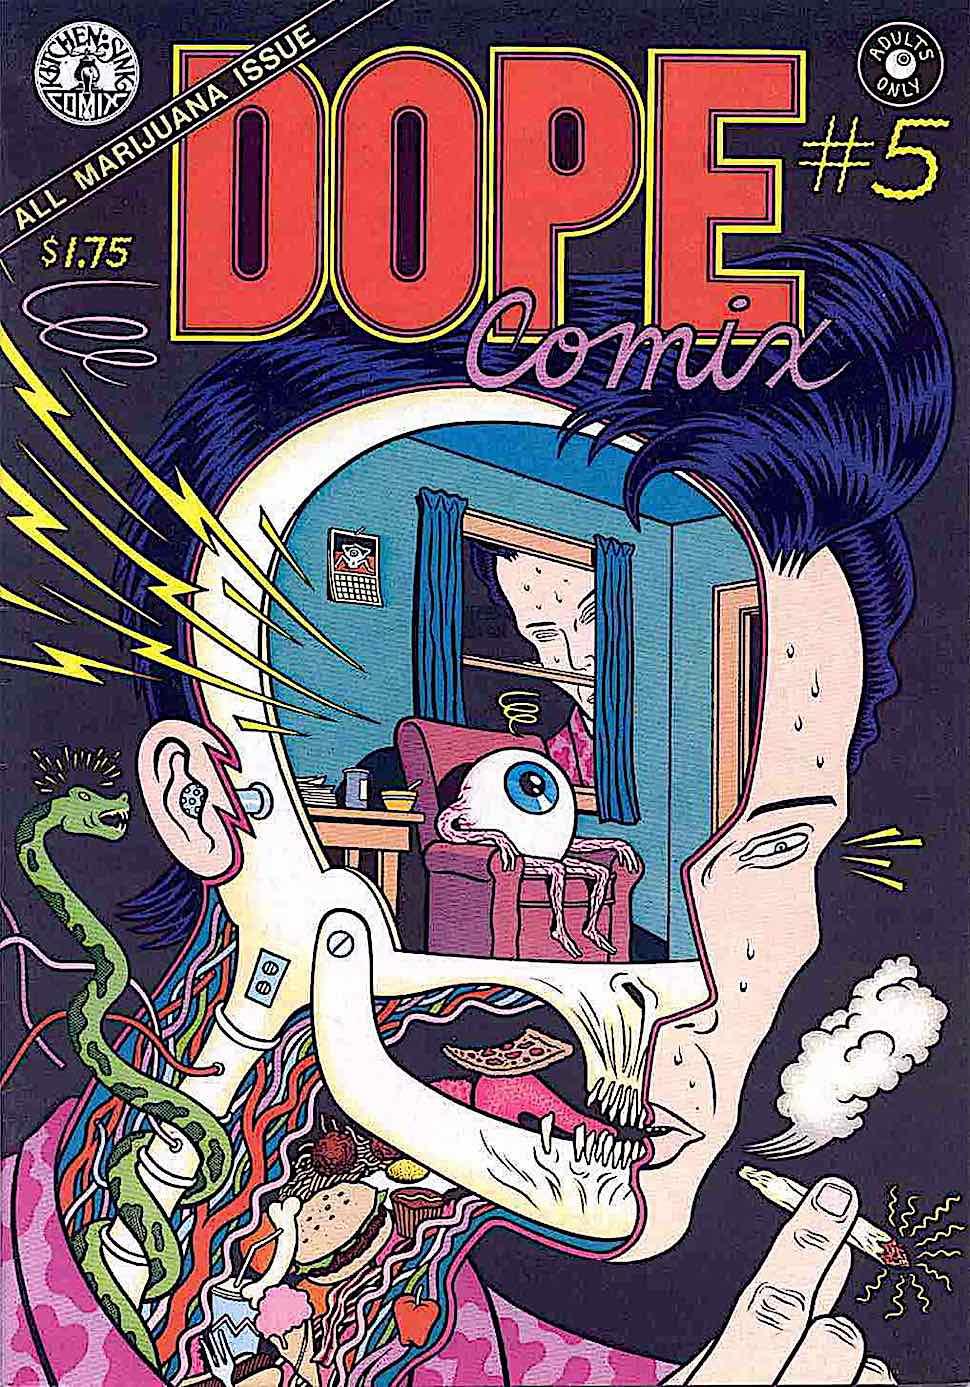 Charles Burns Dope Comics, All Marijuana Issue, a strange man smoking weed